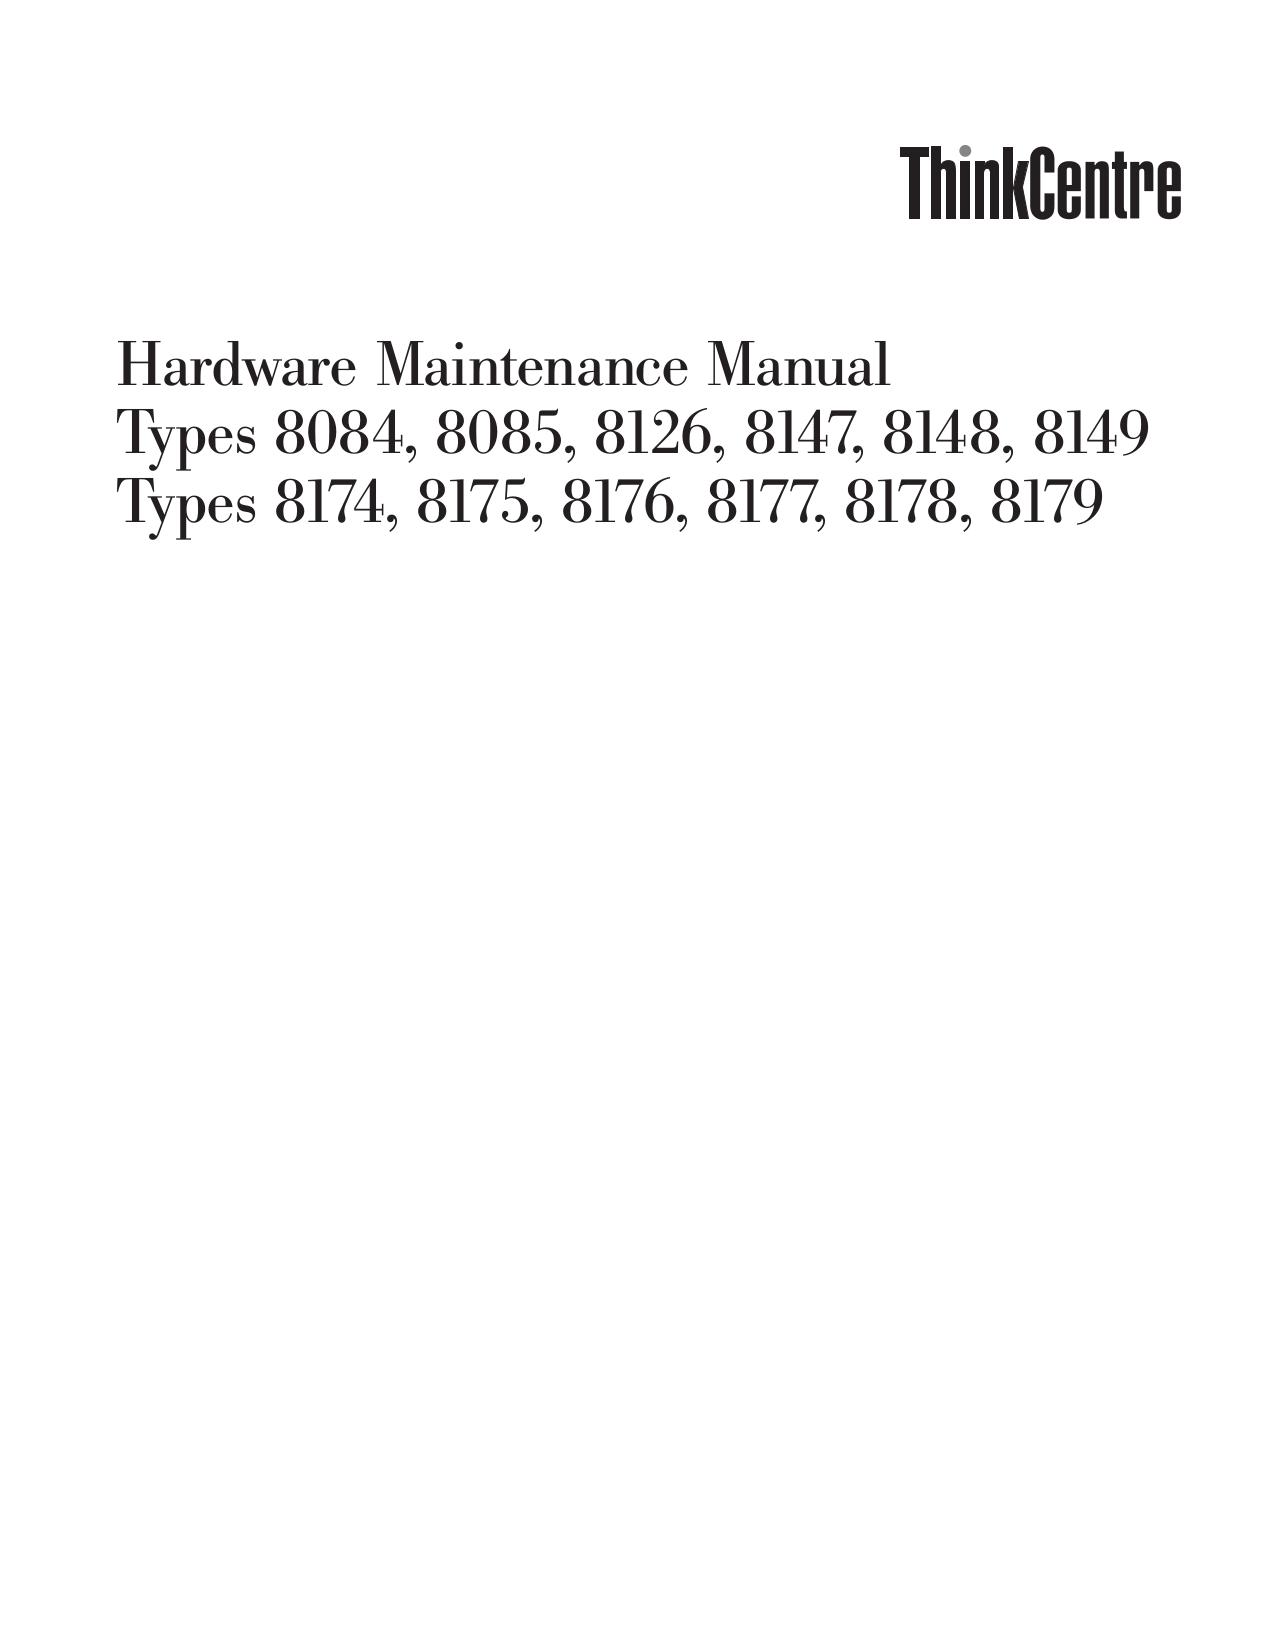 pdf for Lenovo Desktop ThinkCentre A50 8149 manual